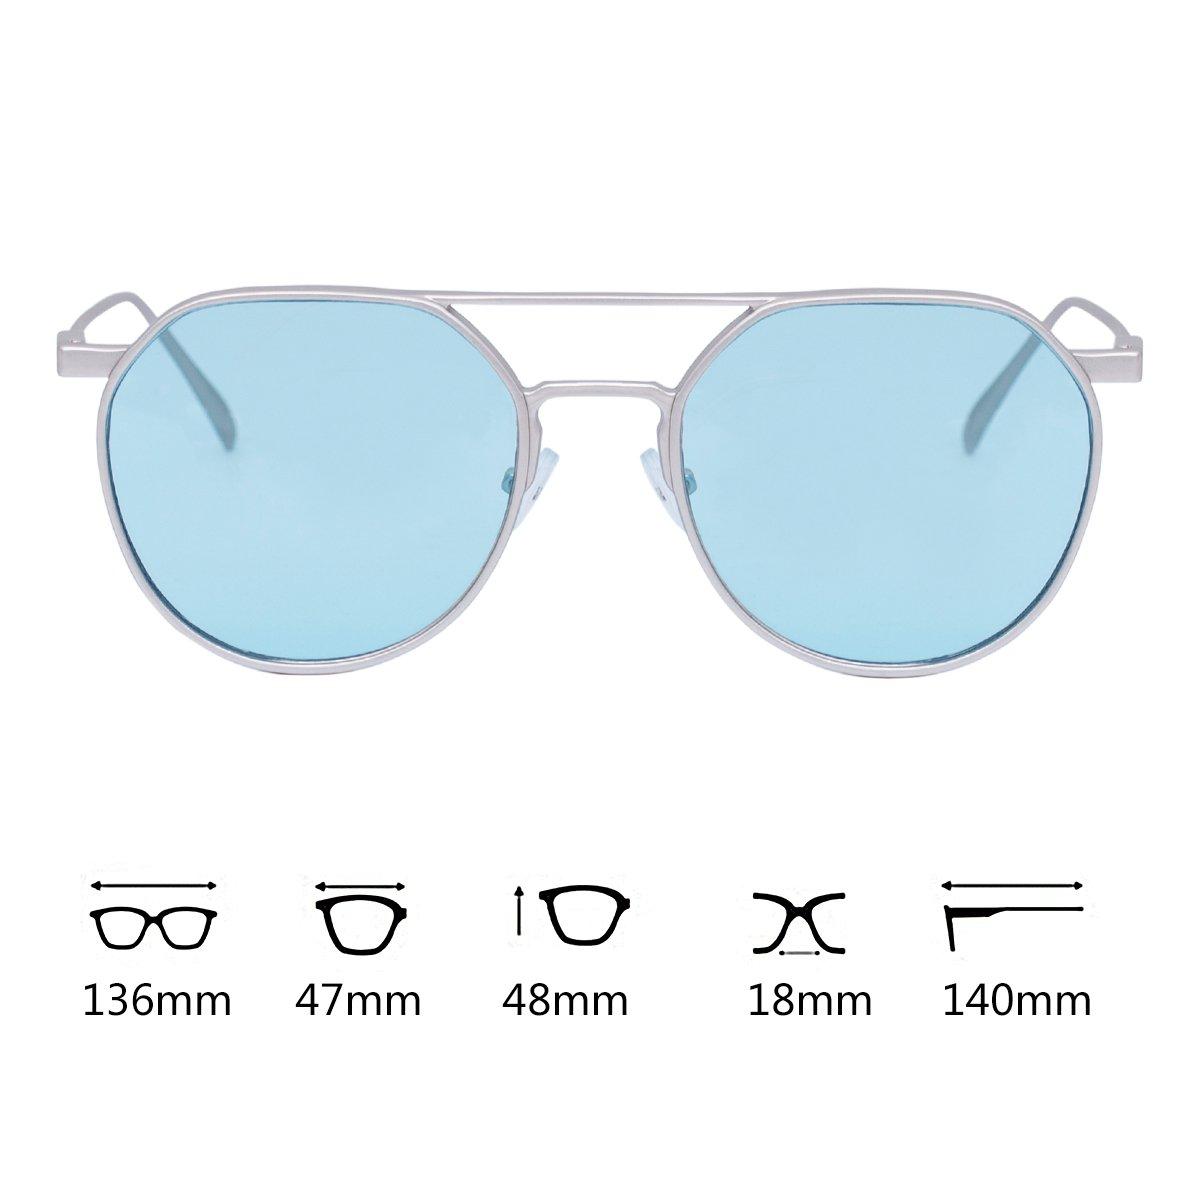 WISH CLUB Round Retro Transparent Sunglasses for Men Women Fashion Vintage 60s Stylish UV 400 Glasses(Blue)